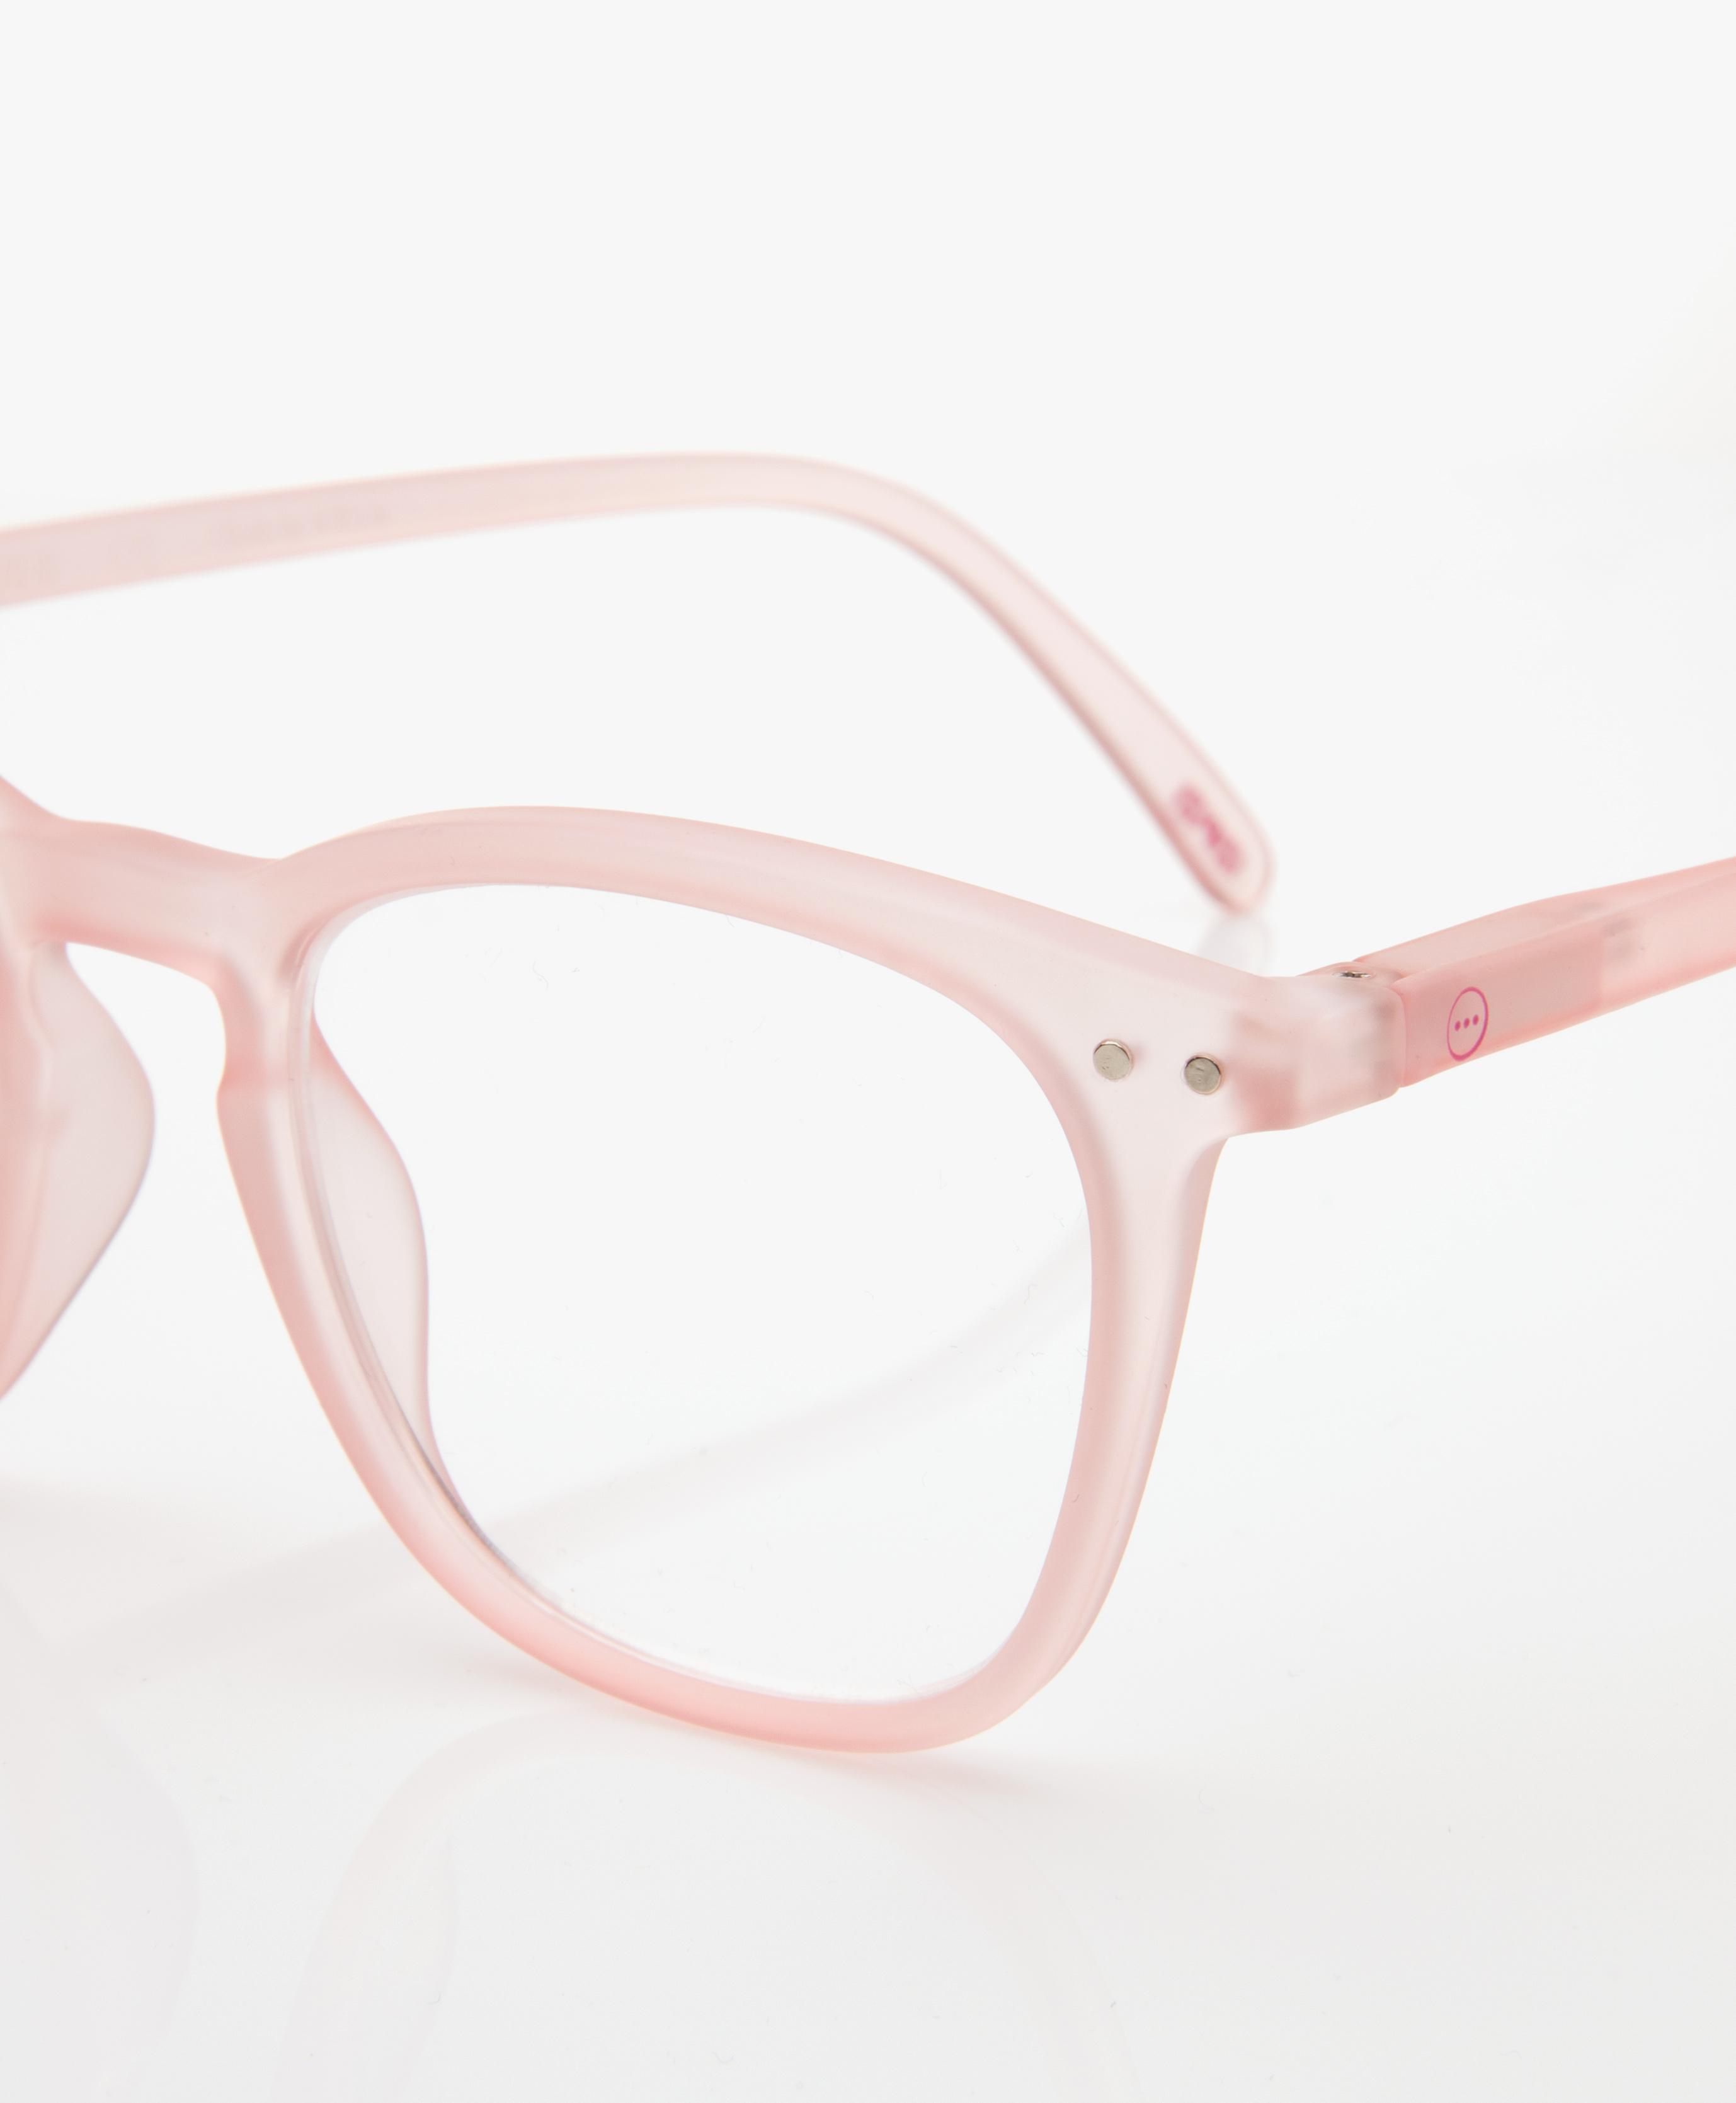 ad9ae13cdf IZIPIZI READING  E Reading Glasses - Pink Halo - reading  e pink halo